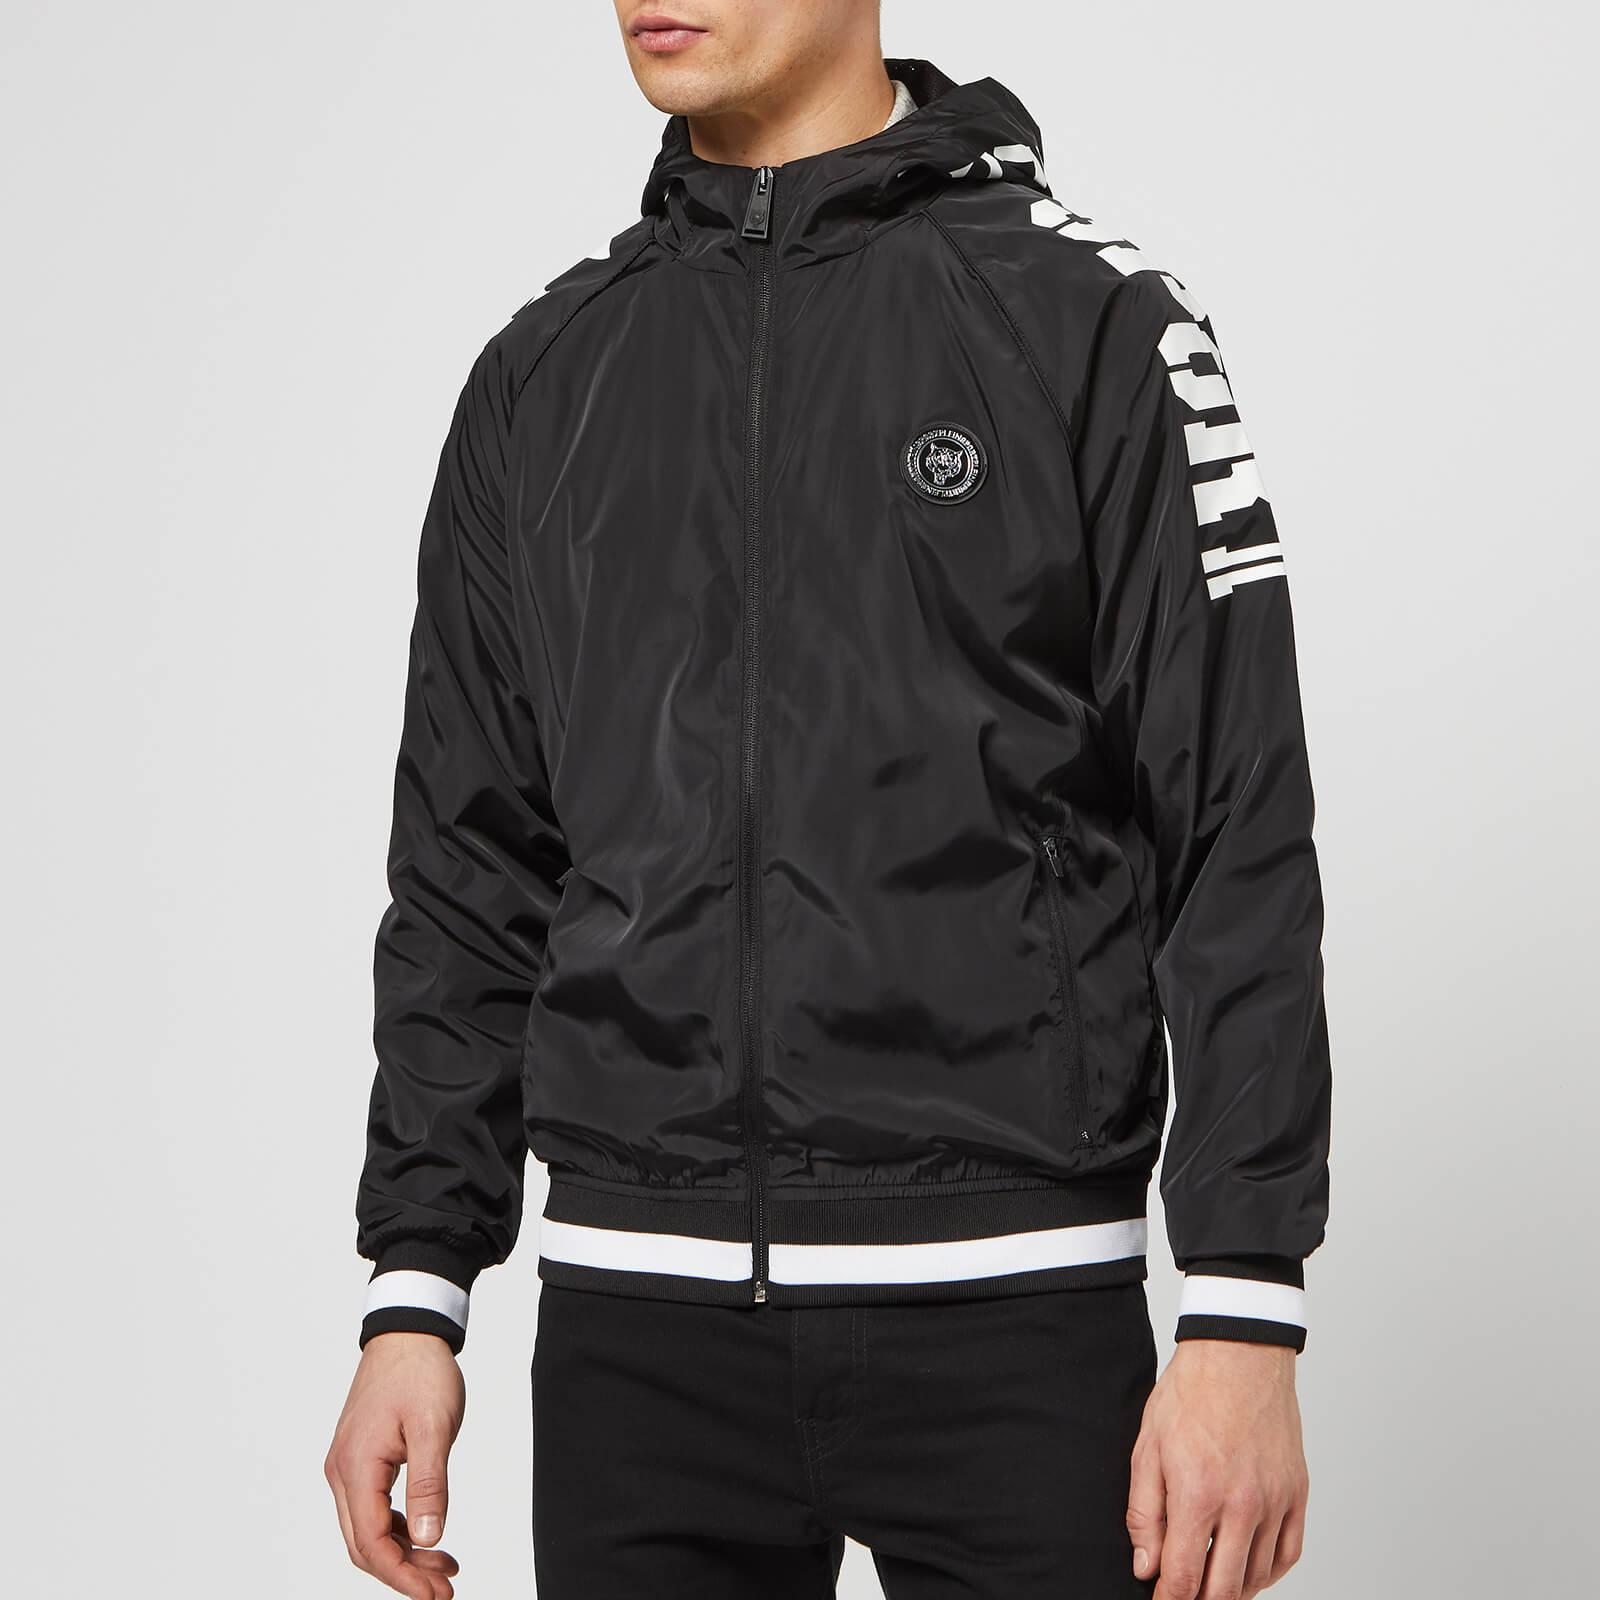 Plein Sport Men's Nylon Jacket Statement - Black/White - XL - Black/White